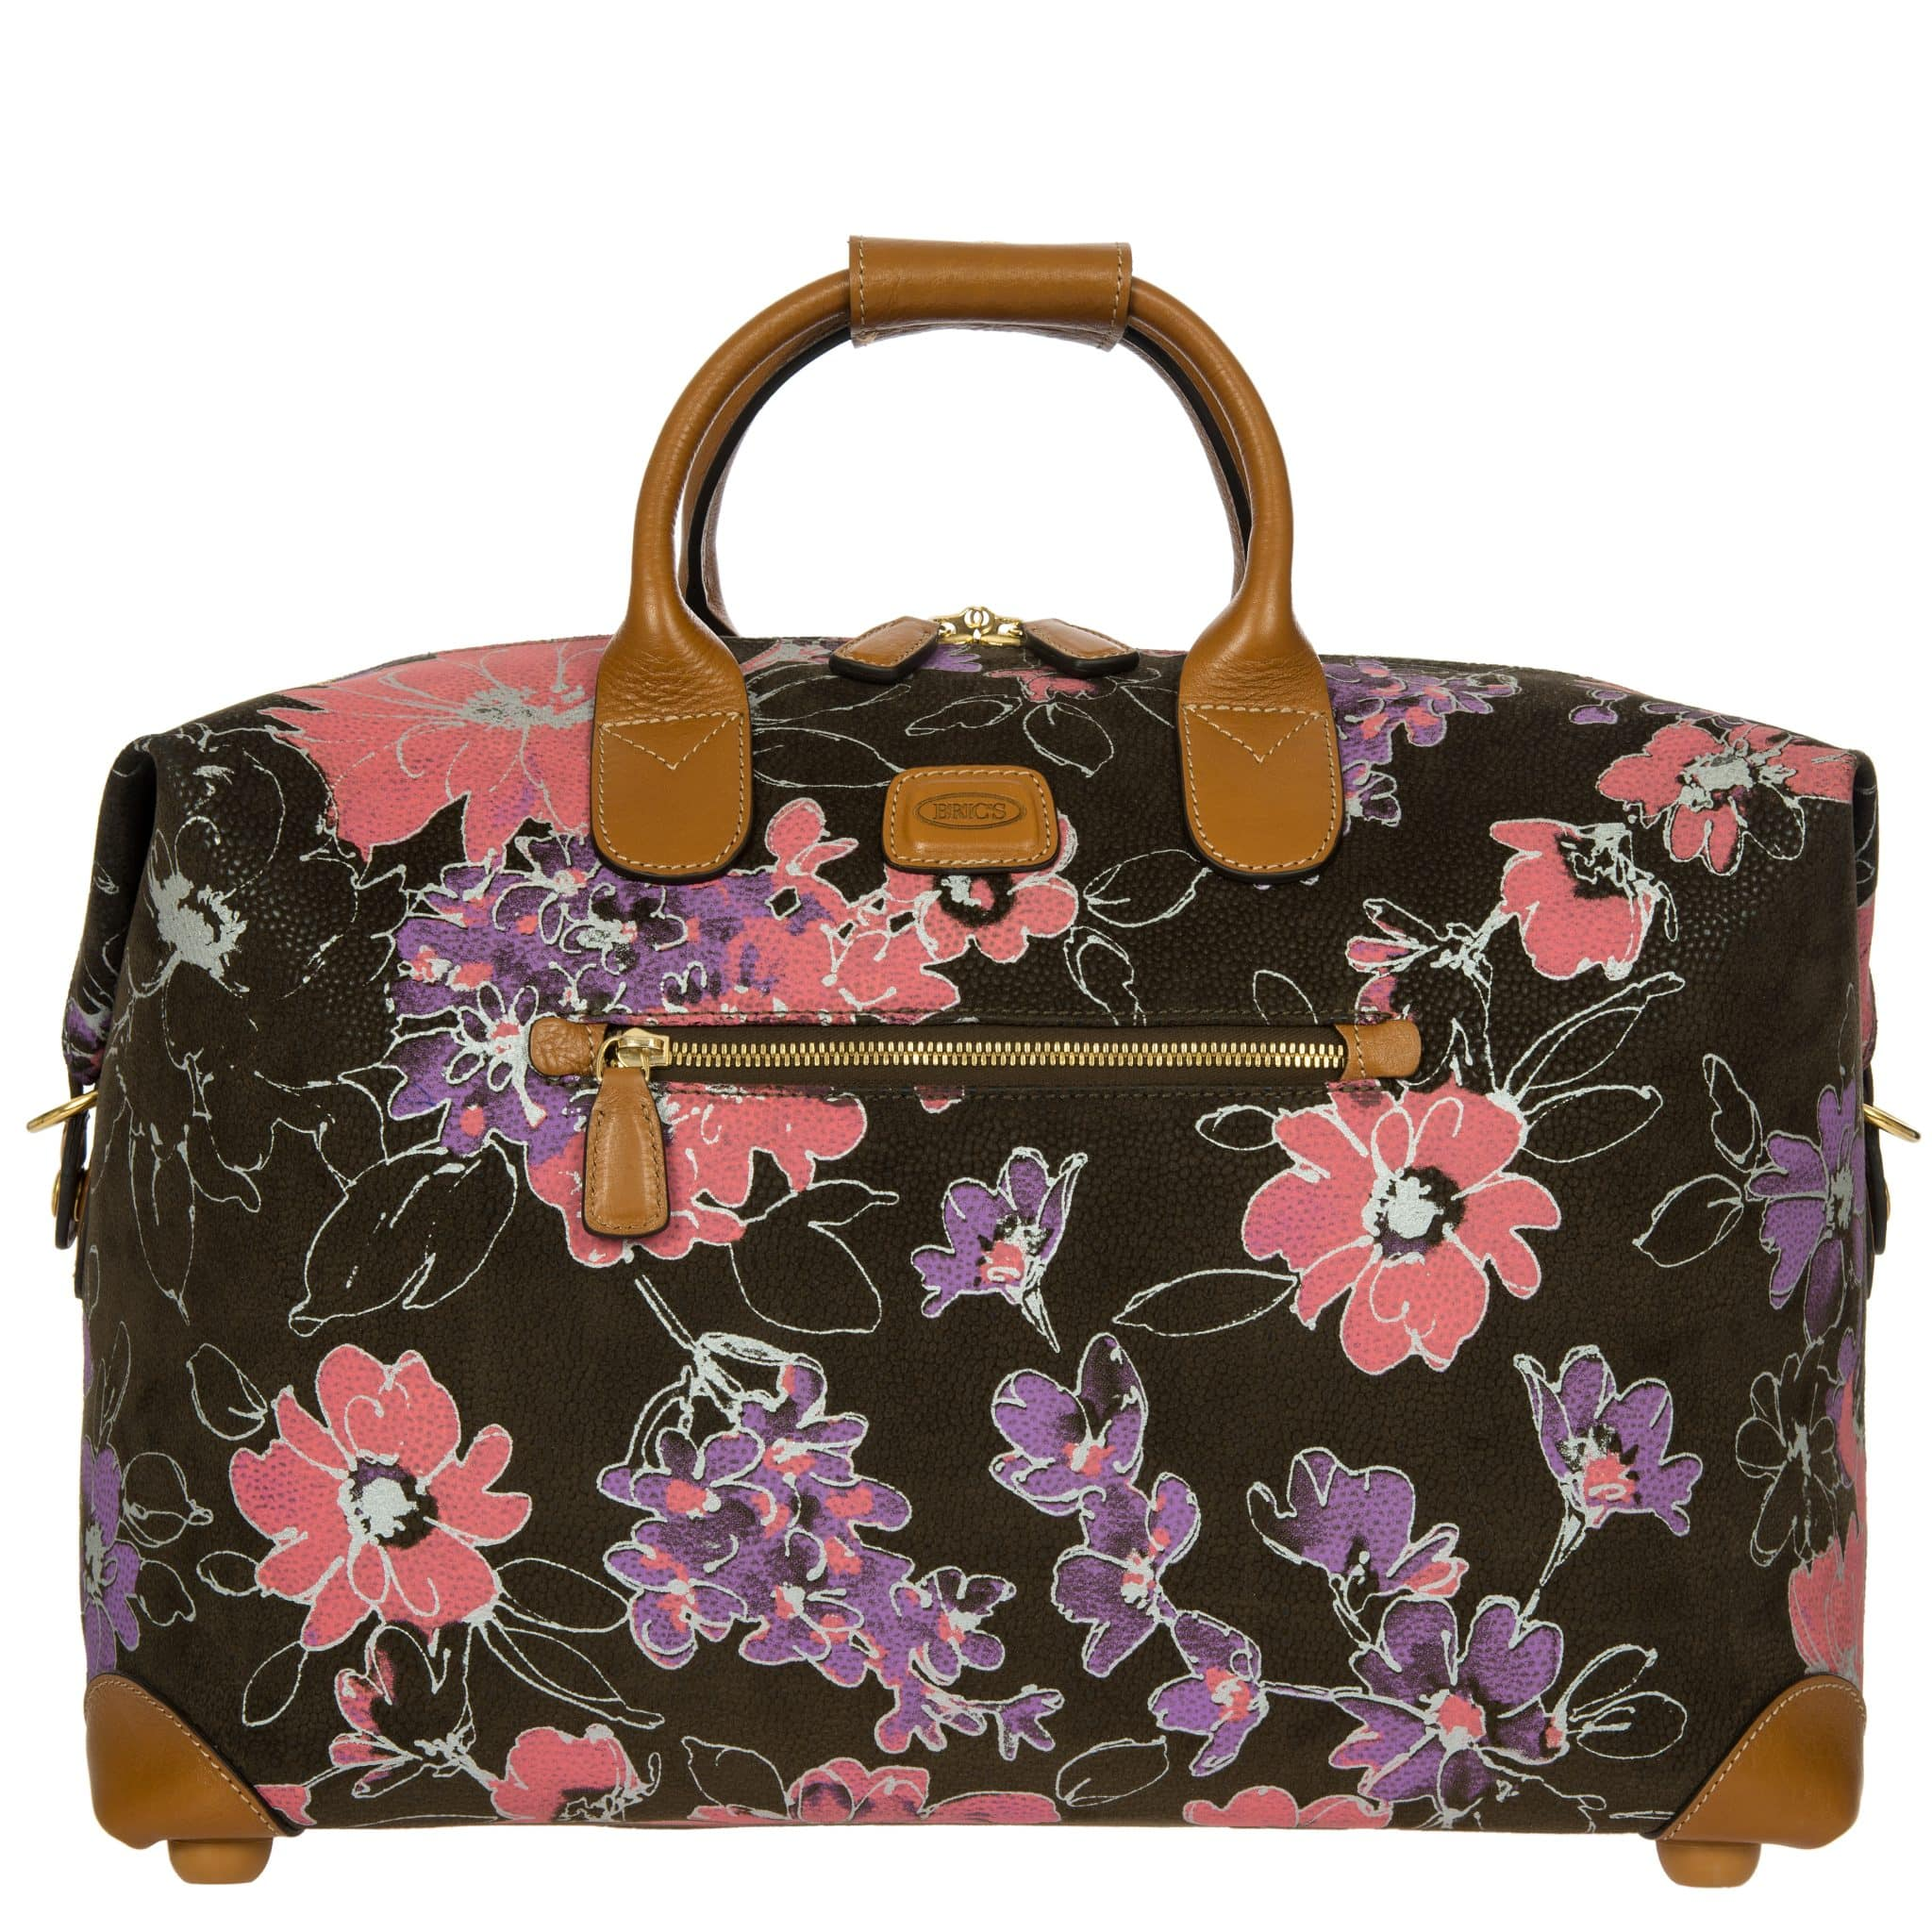 Túi du lịch nữ Life 65 Holdall B6530202.023